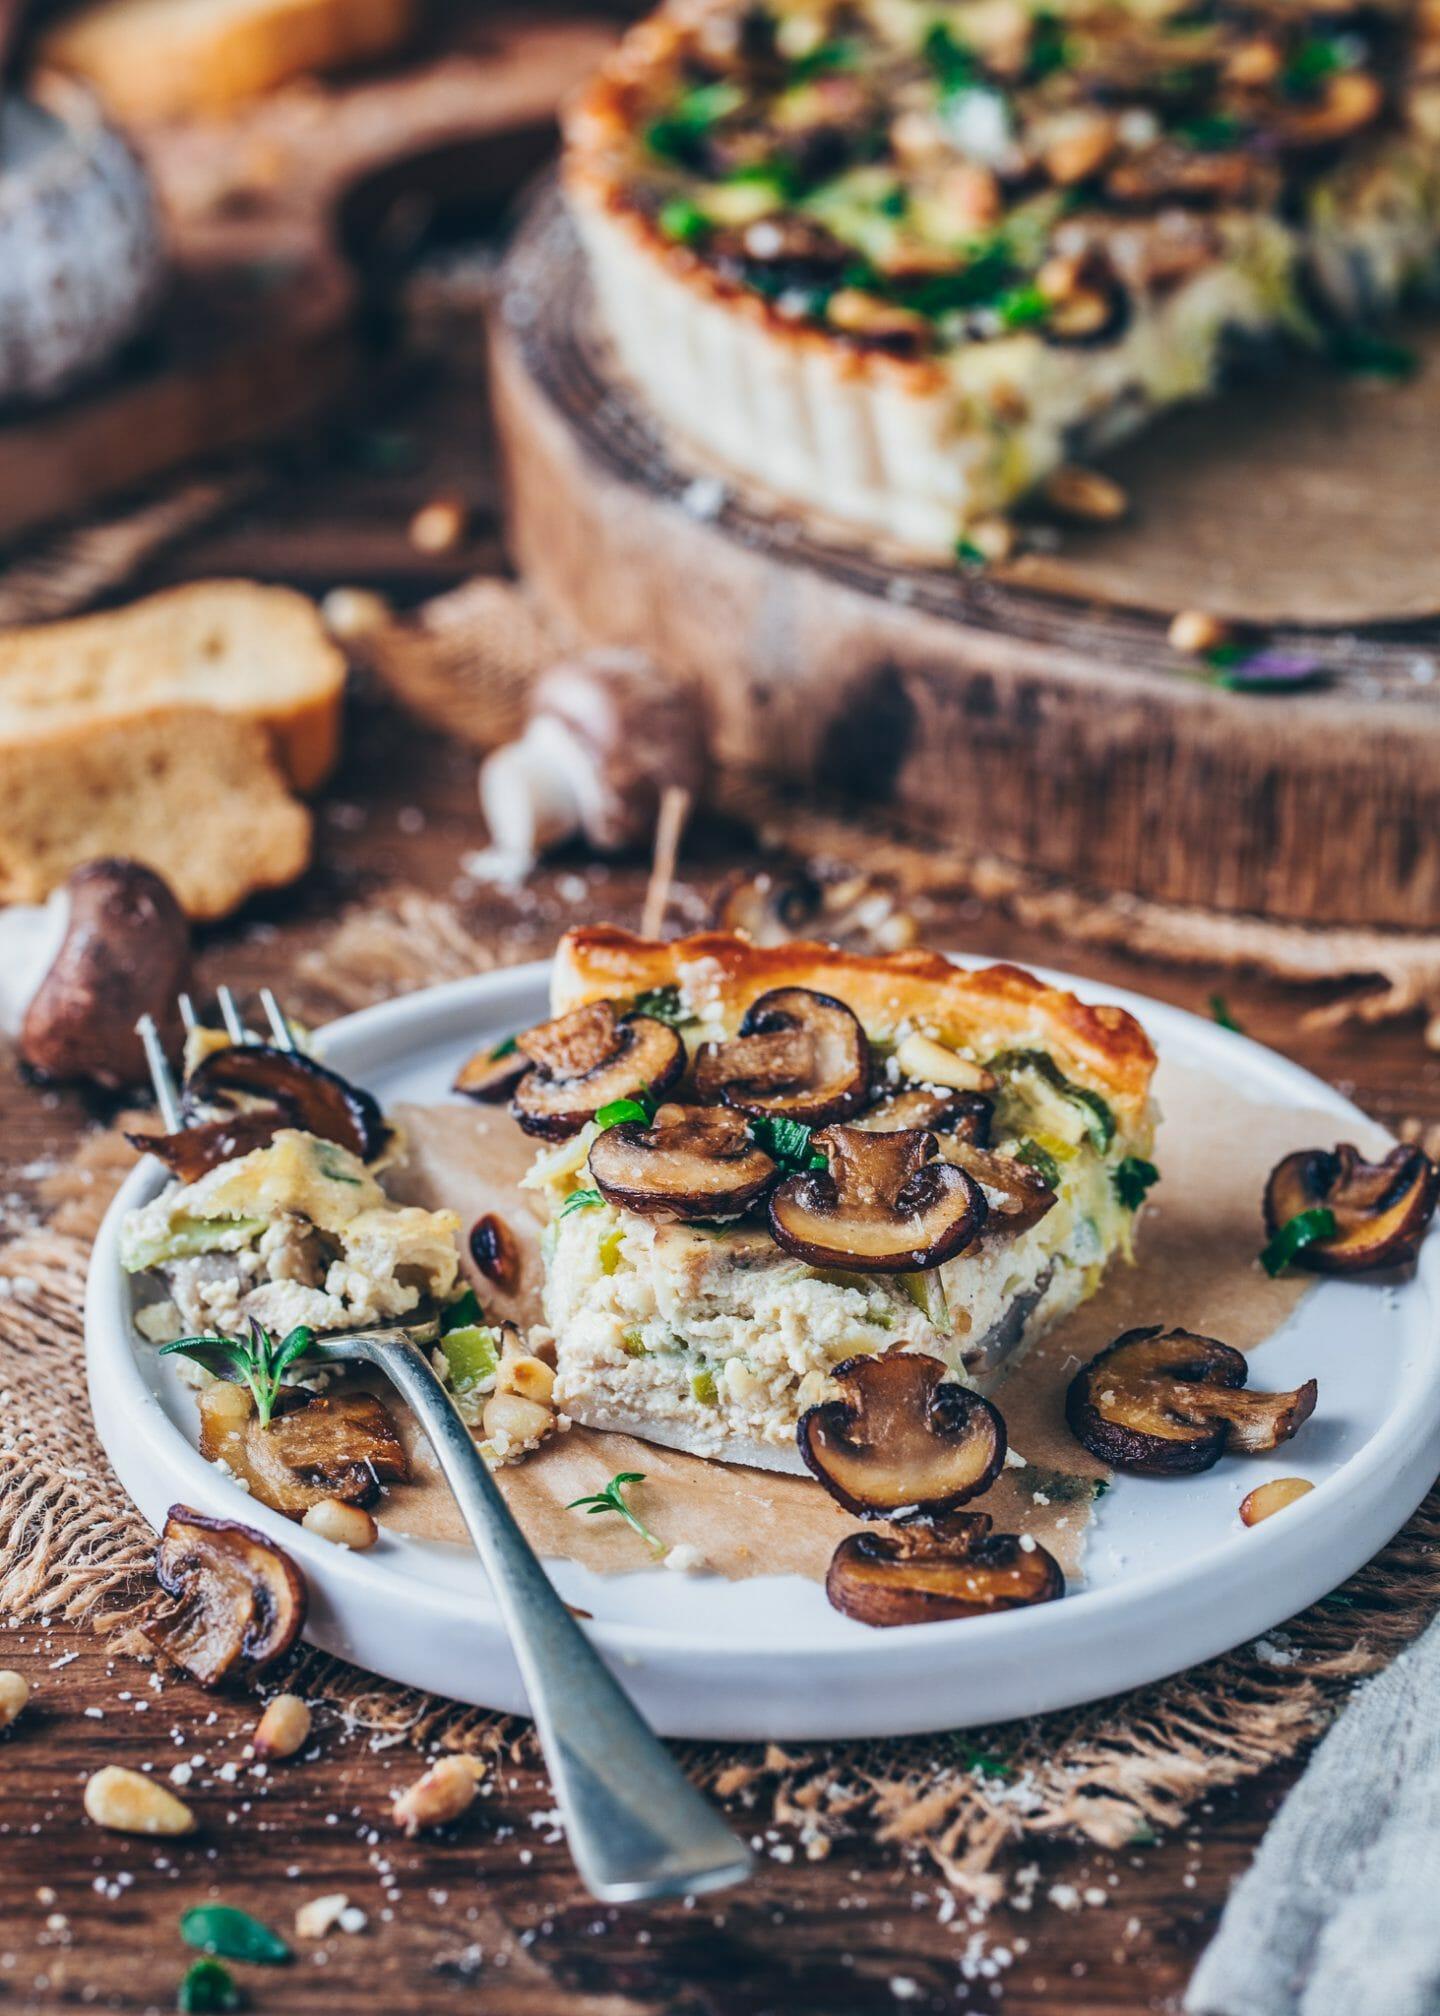 mushroom and leek tart with vegan tofu quiche filling